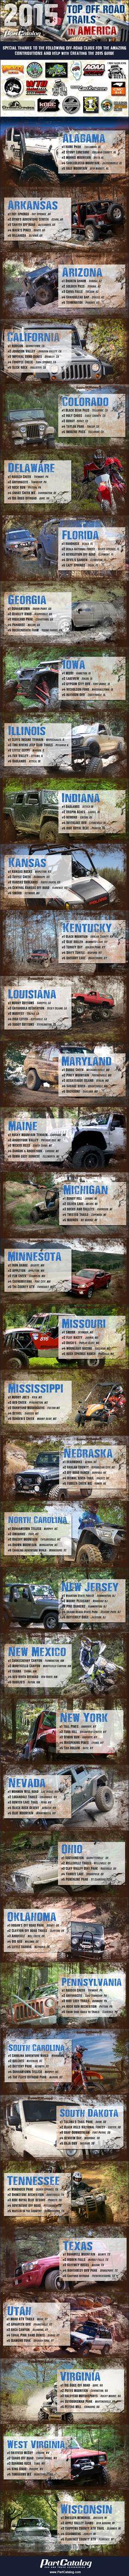 2015 Top Off Road Trails in America